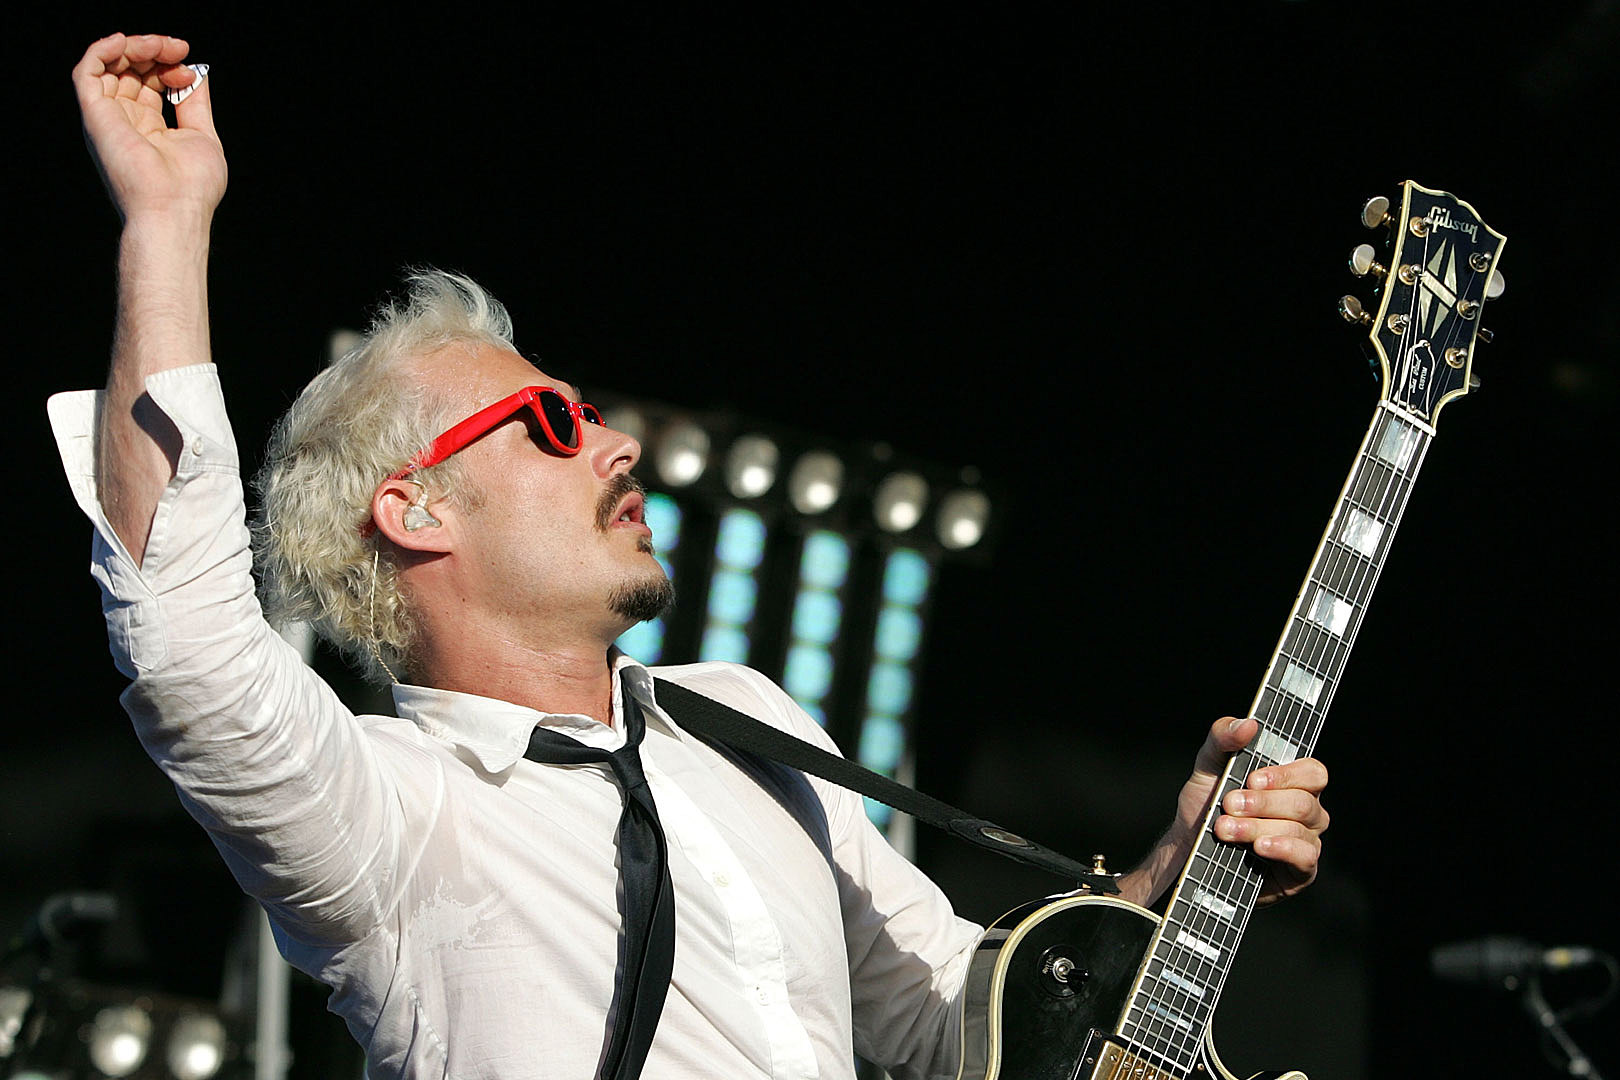 Silverchair's Daniel Johns May Never Perform Live Again